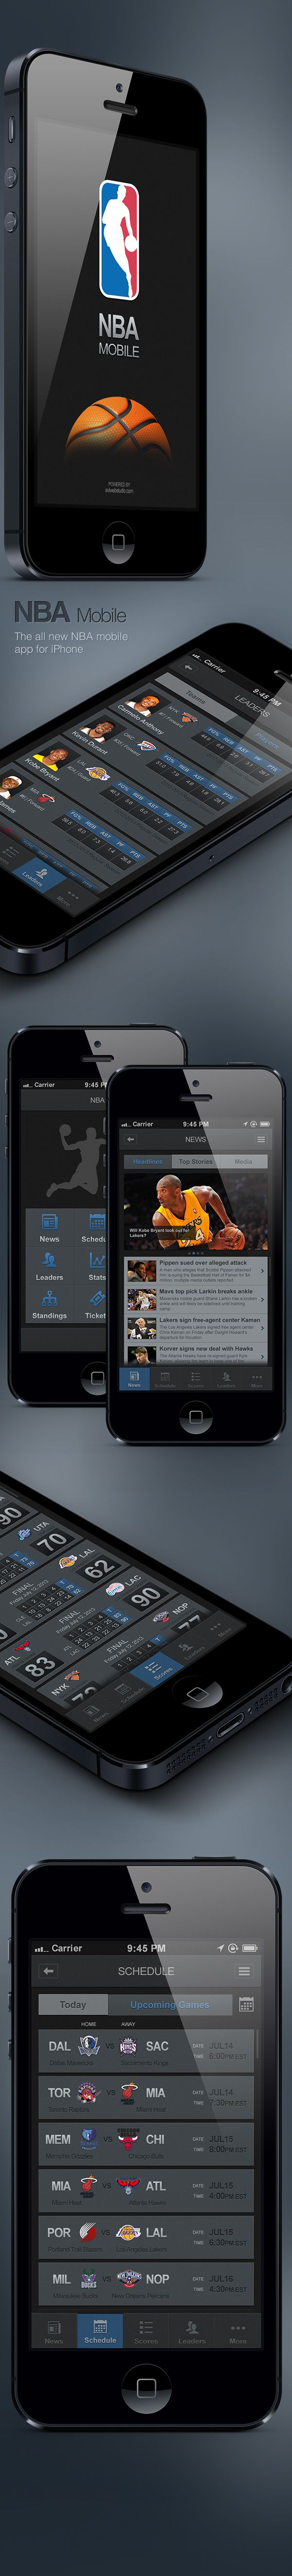 NBA Mobile App for iPhone by Alex V. Tarloyan, via Behance